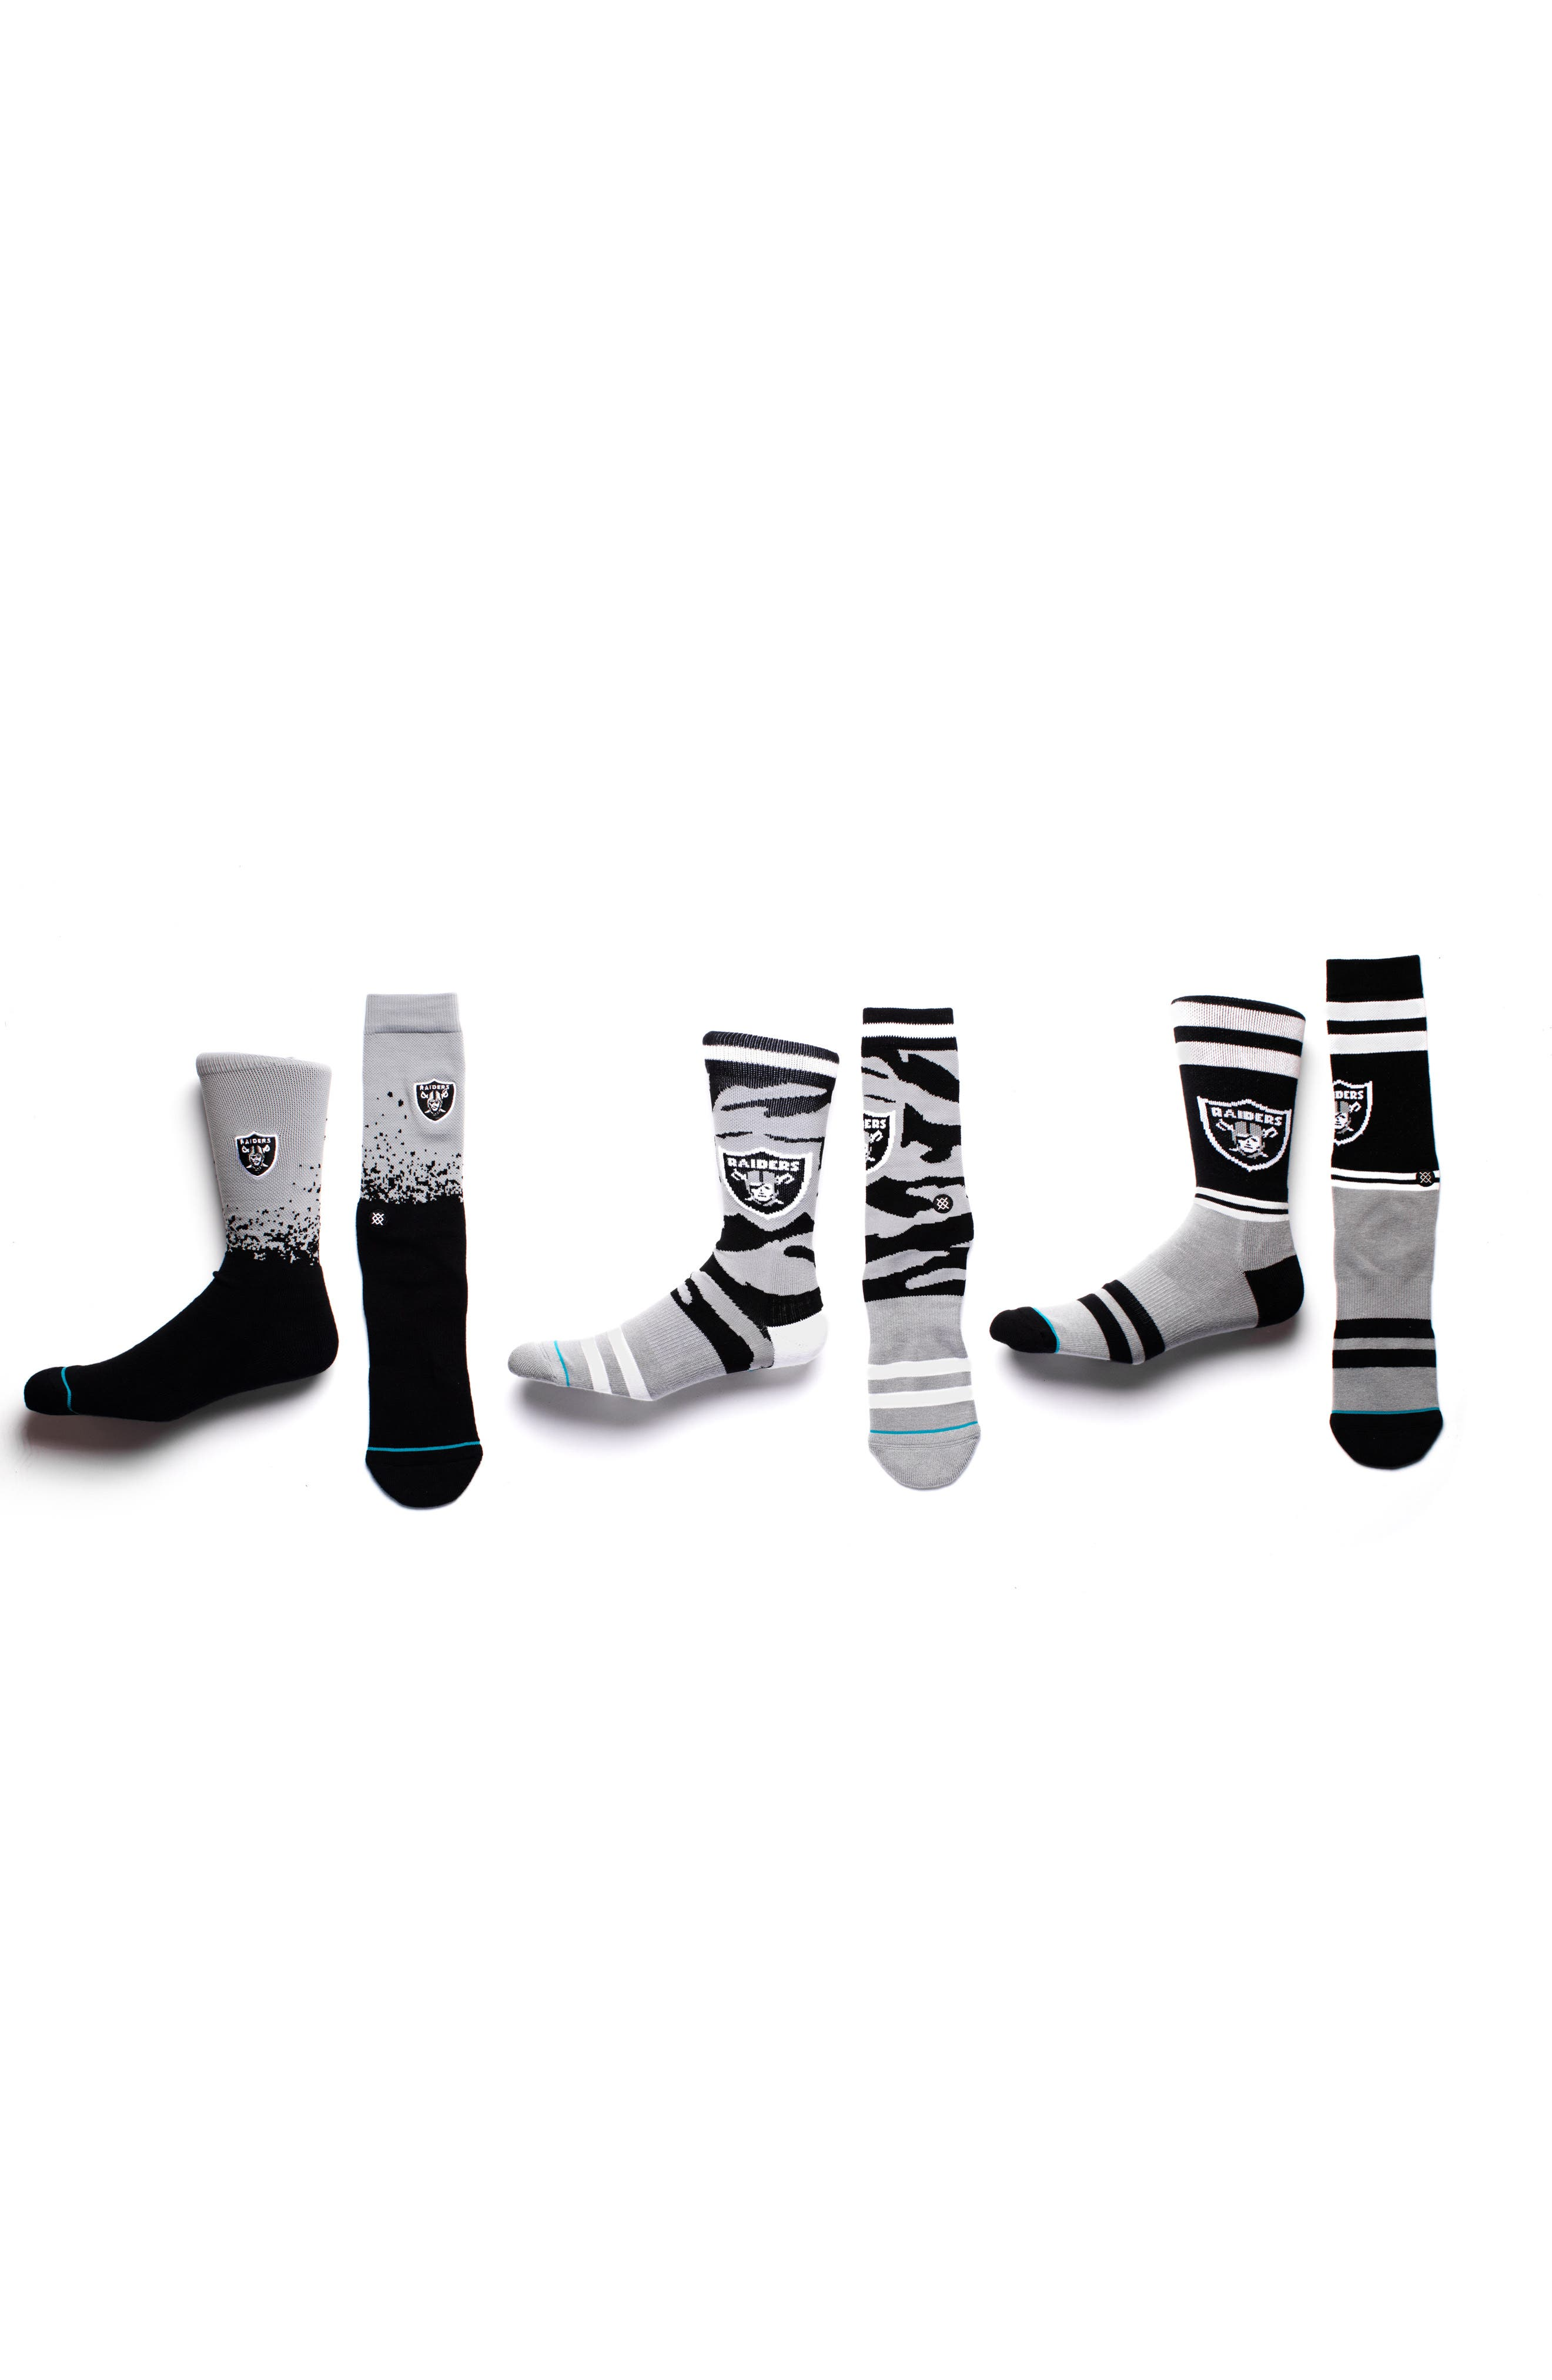 Oakland Raiders - Fade Socks,                             Alternate thumbnail 3, color,                             Black